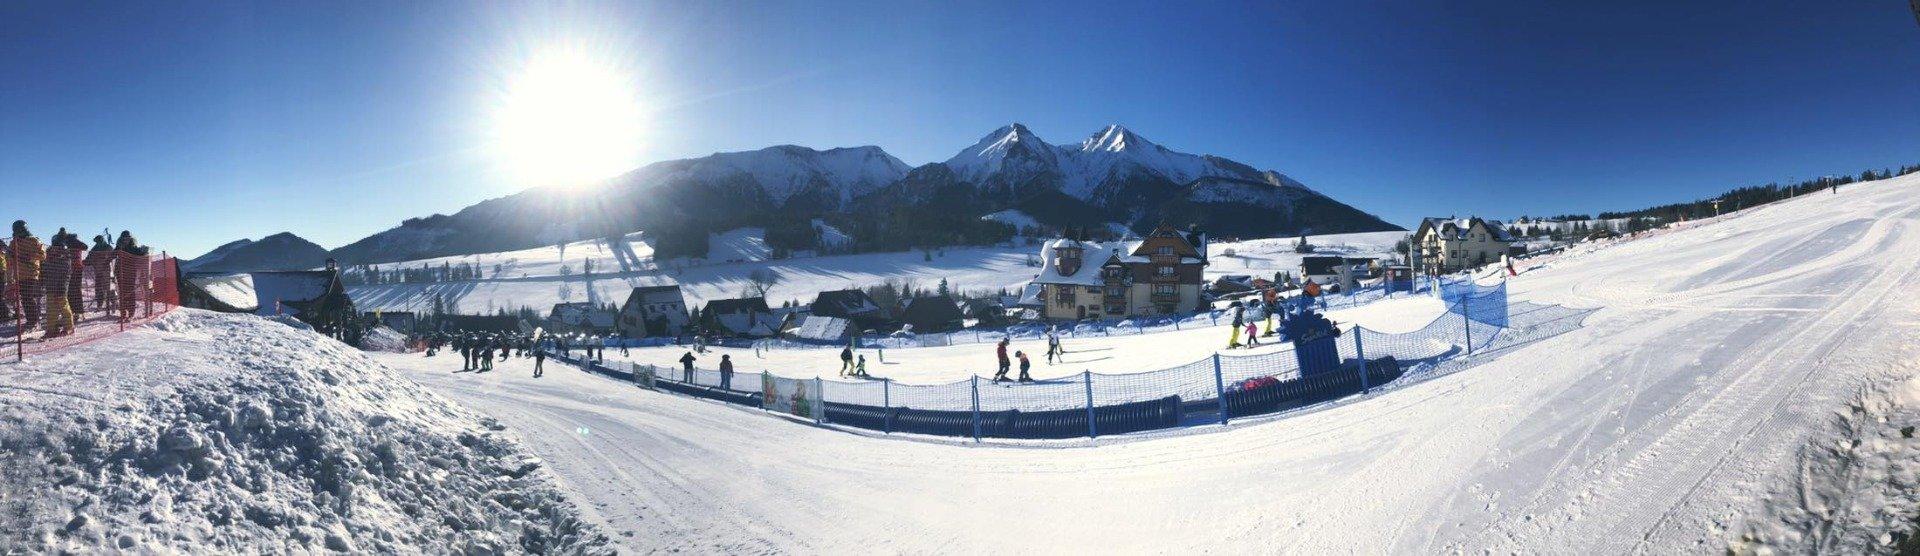 Strachan Ski Centrum - © facebook | Strachan Ski Centrum